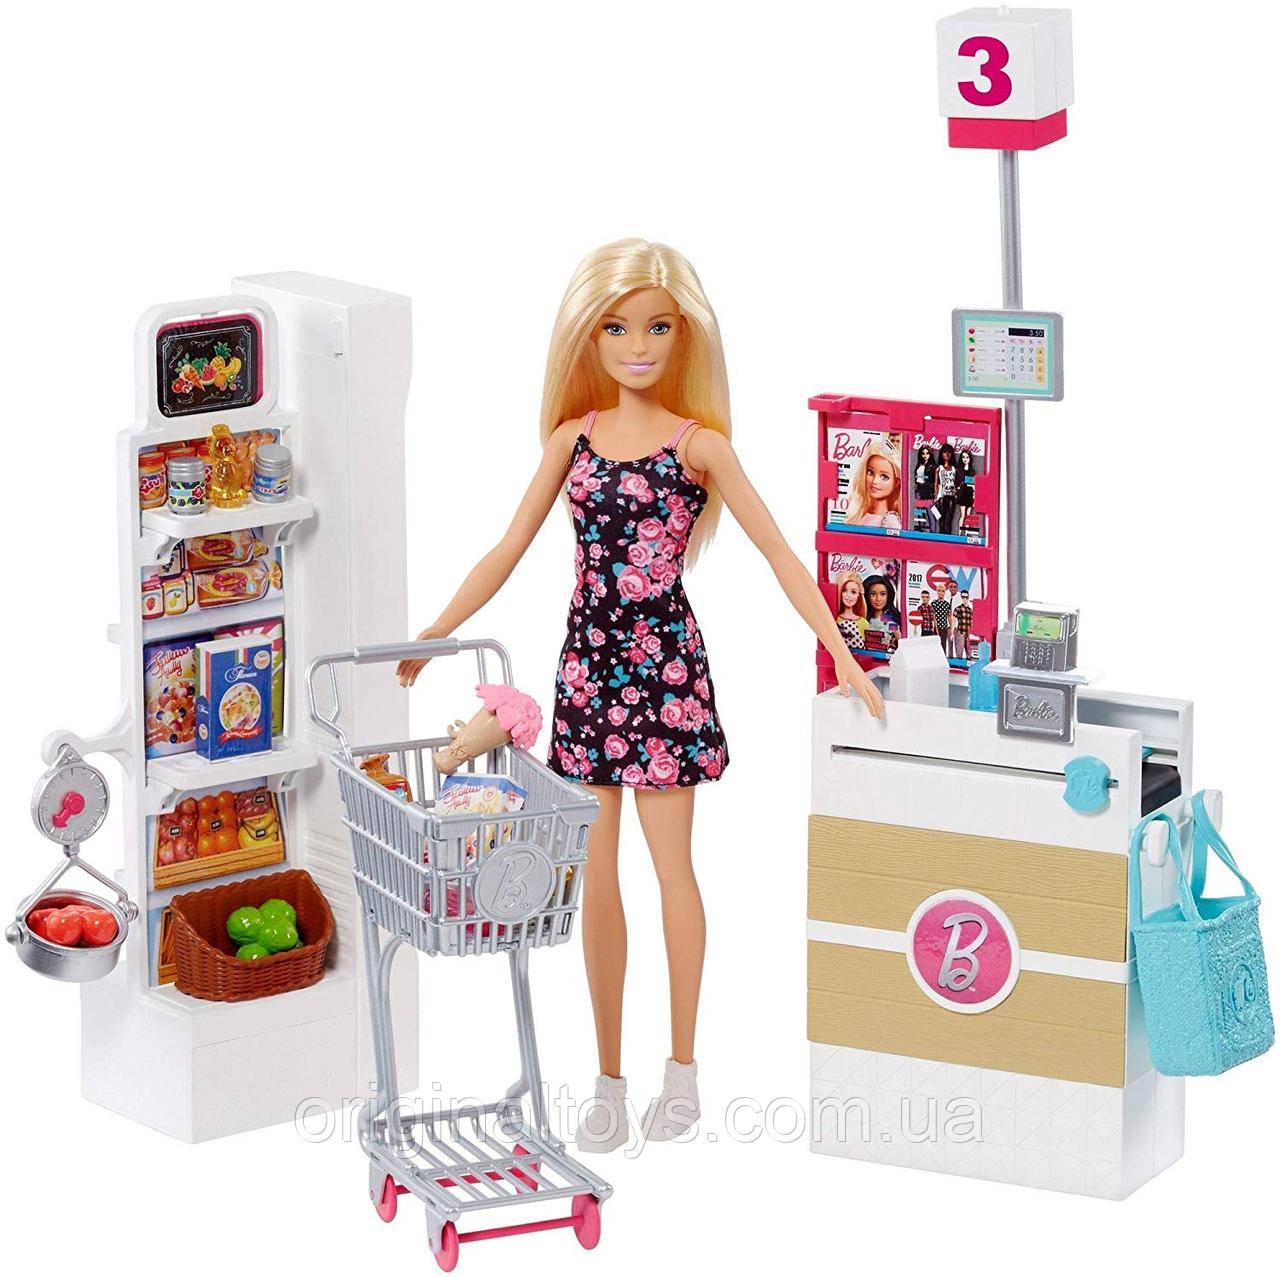 Набор кукла Барби Супермаркет Barbie Supermarket Mattel FRP01